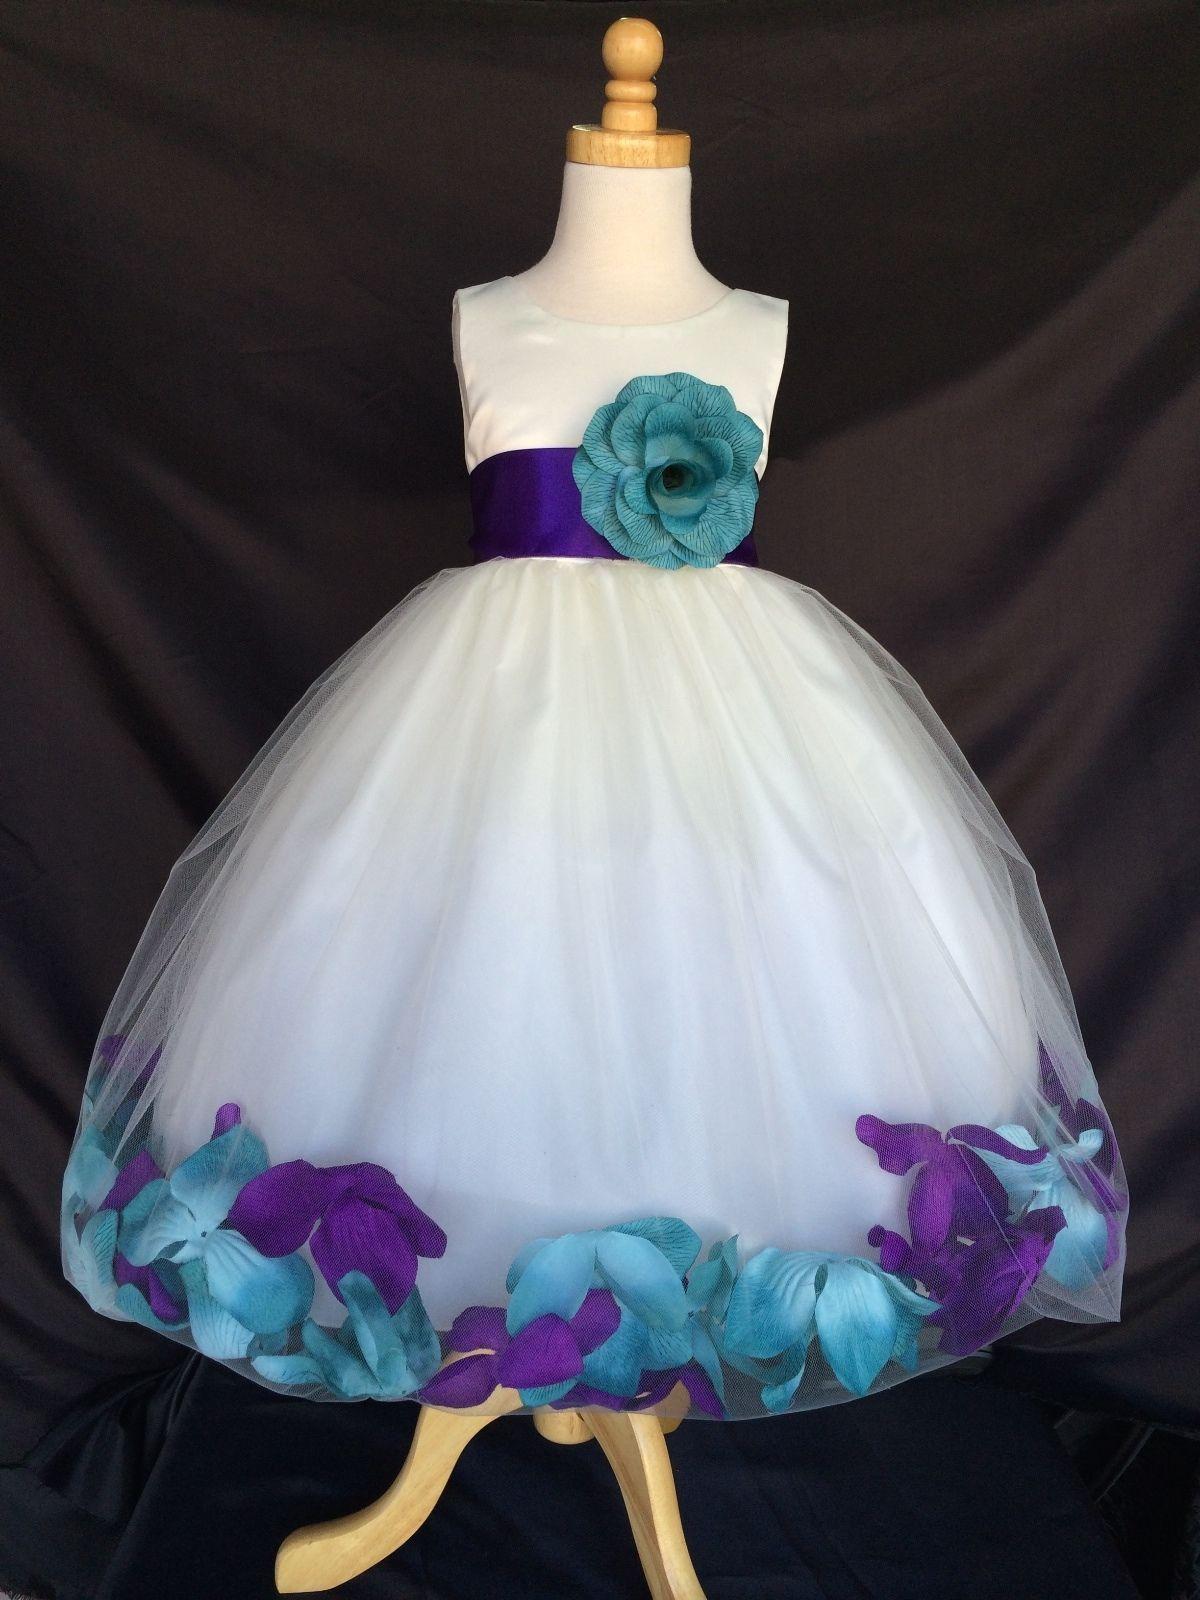 417dc1bdc5db Ivory Flower Girl Bridesmaids Mix Teal   Purple Mardi Grass Petal ...